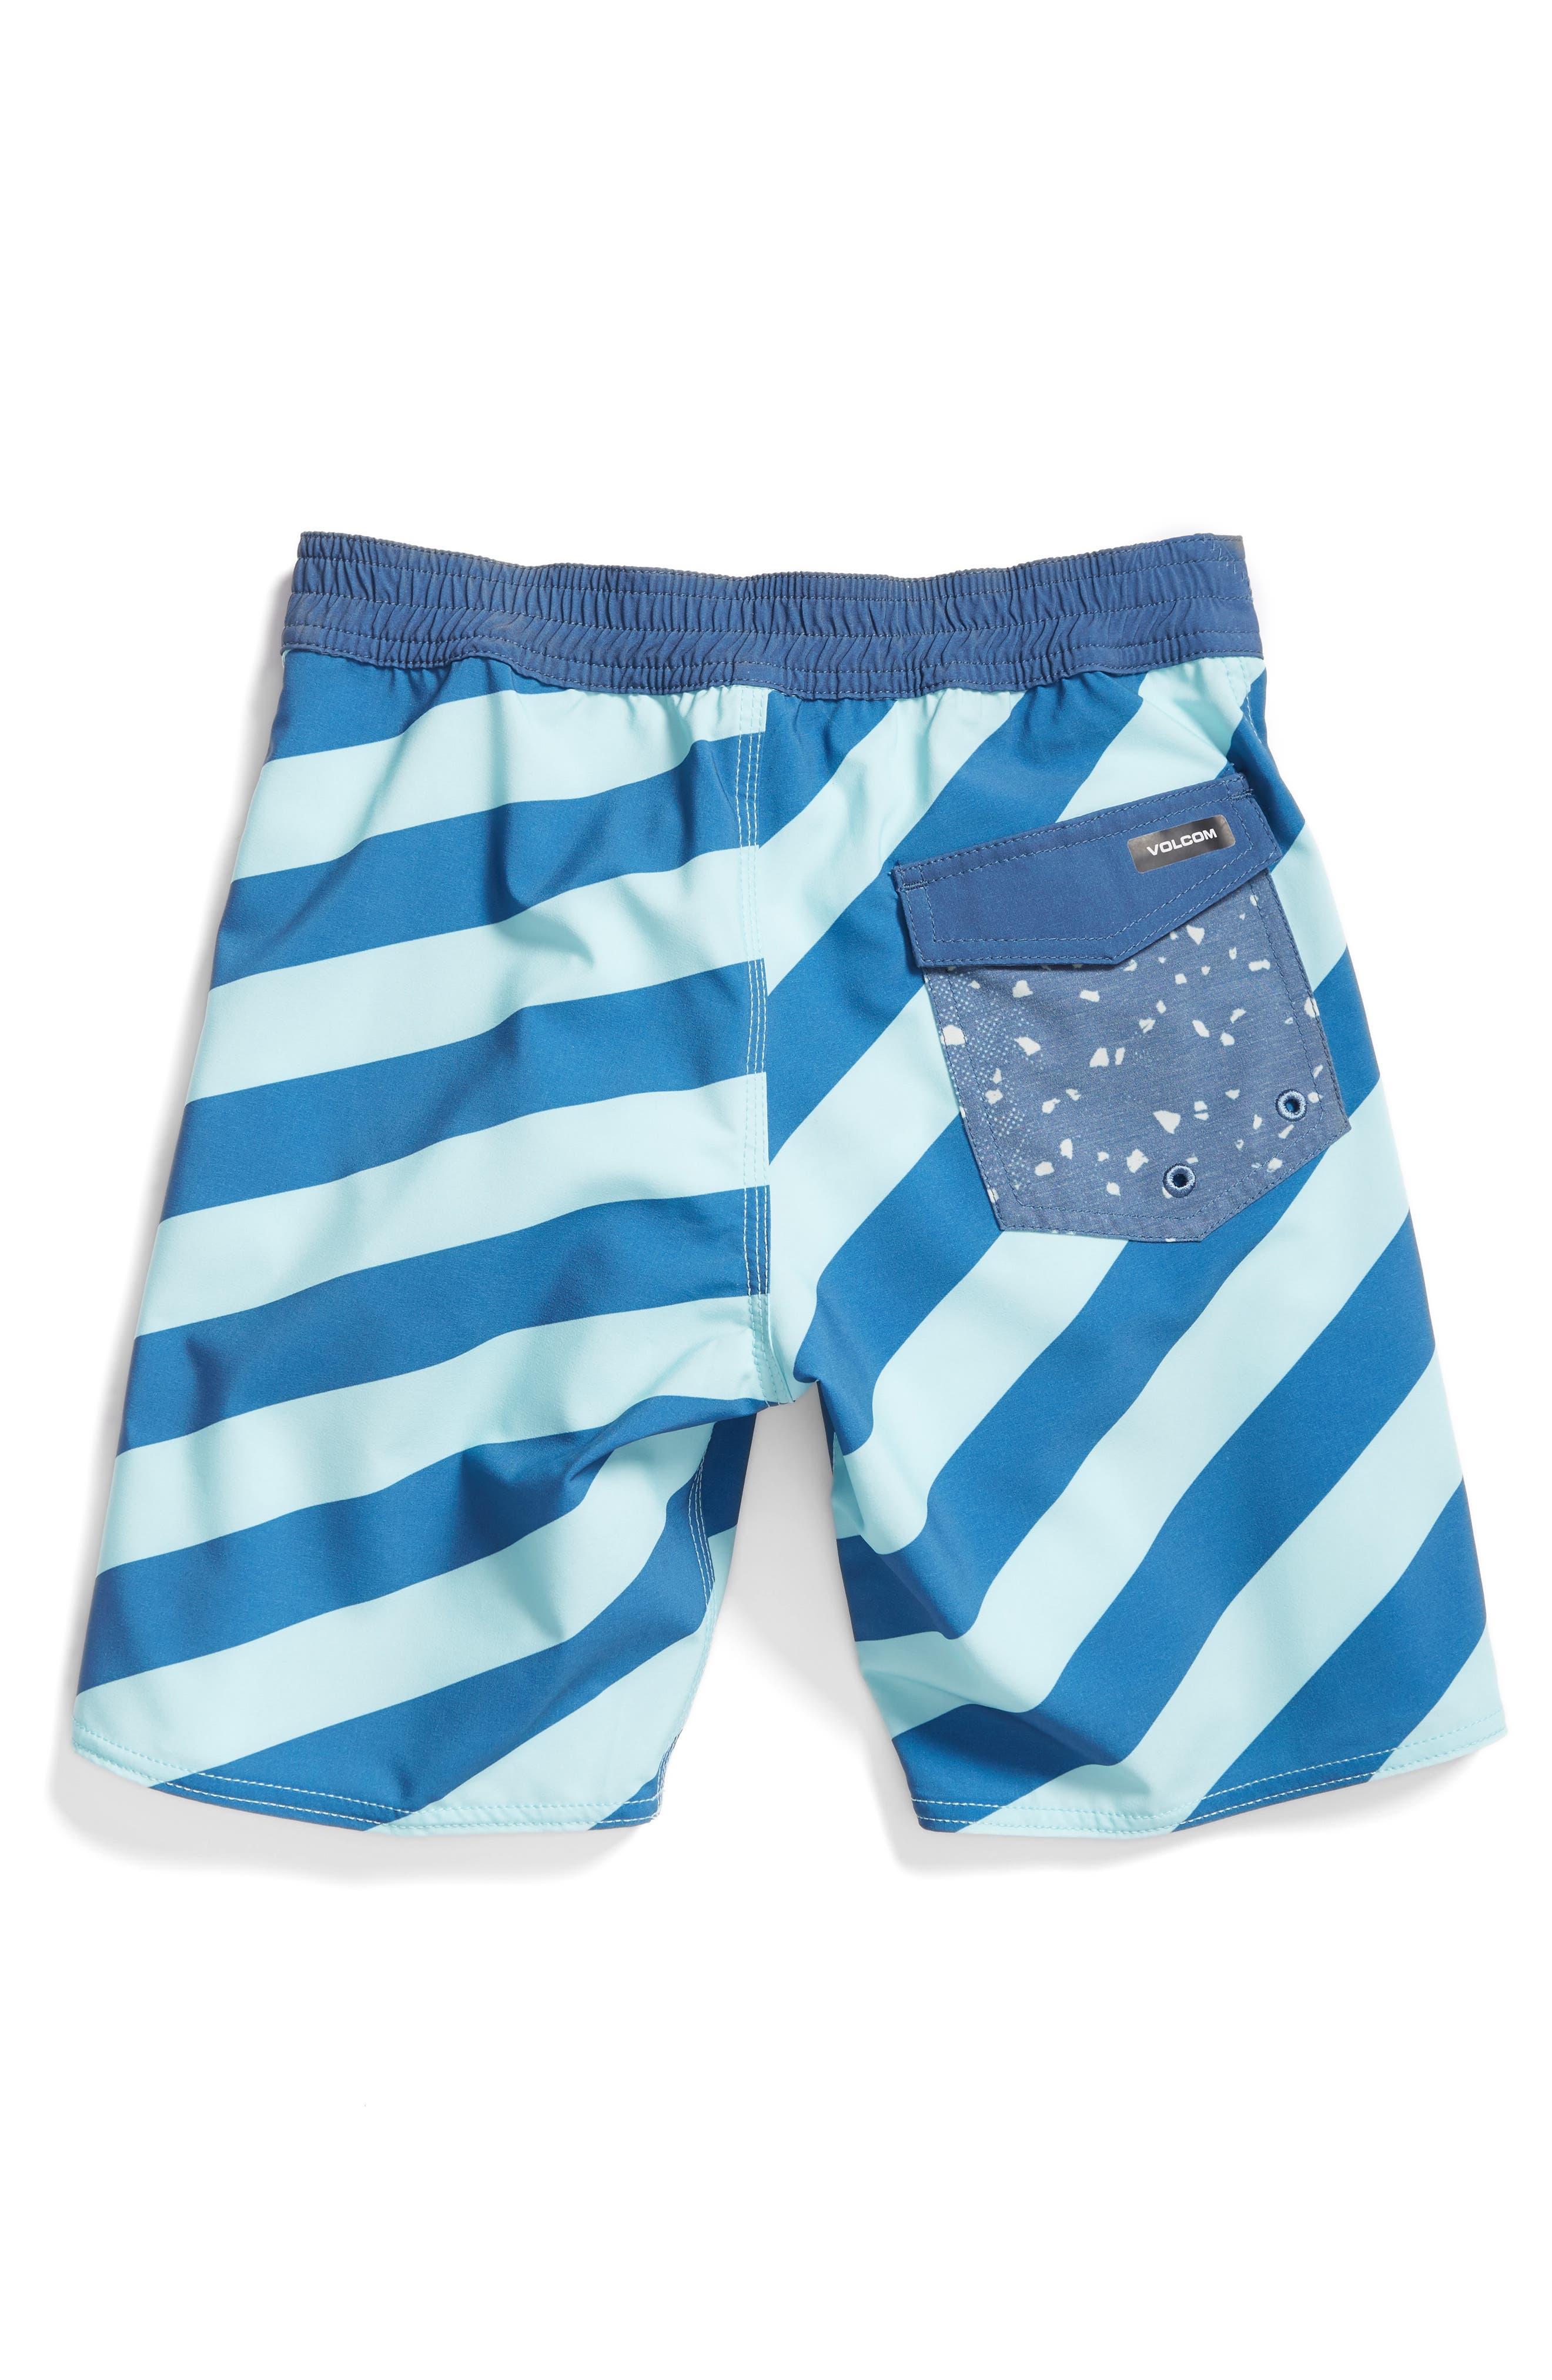 Stripey Jammer Board Shorts,                             Alternate thumbnail 11, color,